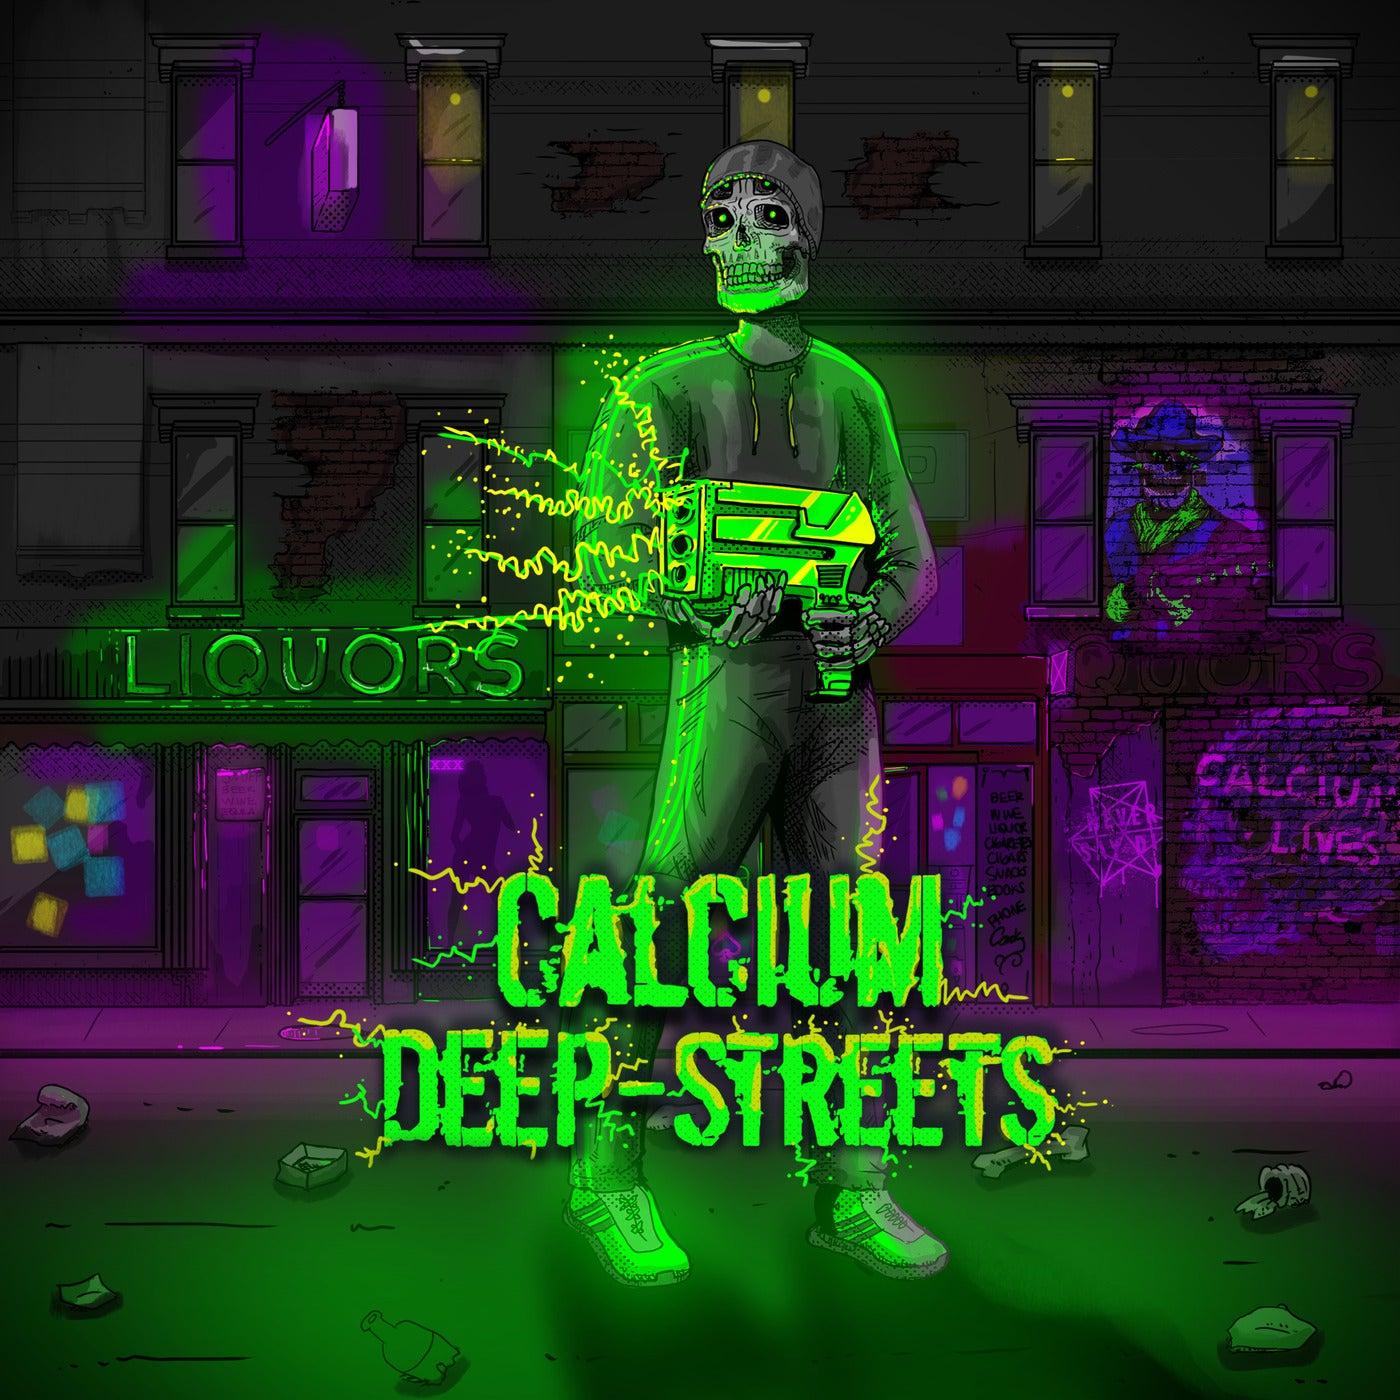 Deep Streets (Original Mix)